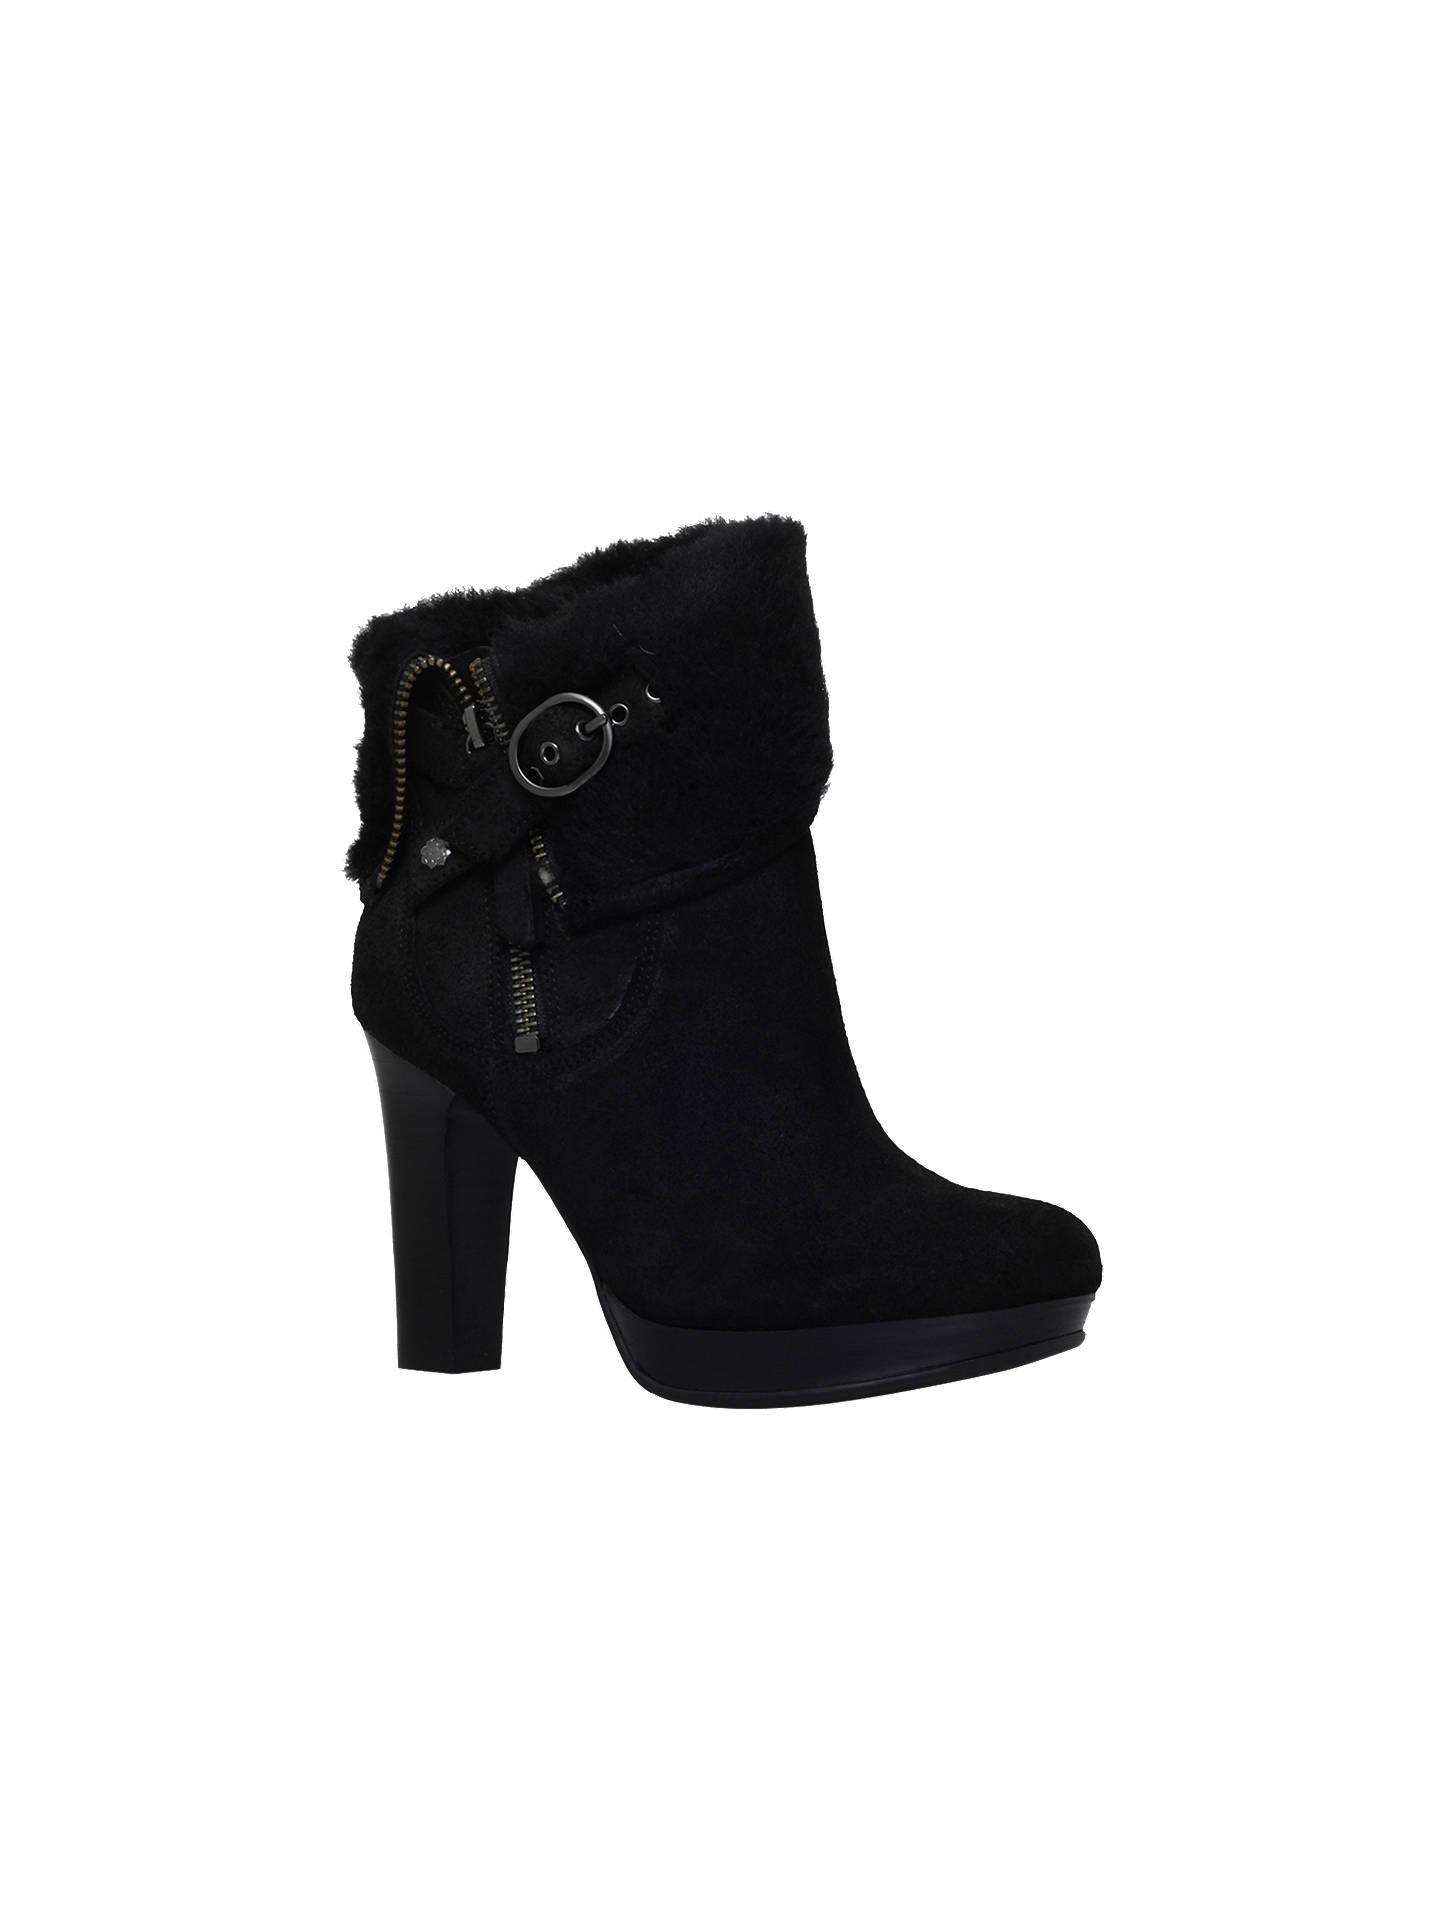 407c8b6bd83 UGG Scarlett High Block Heeled Ankle Boots at John Lewis & Partners